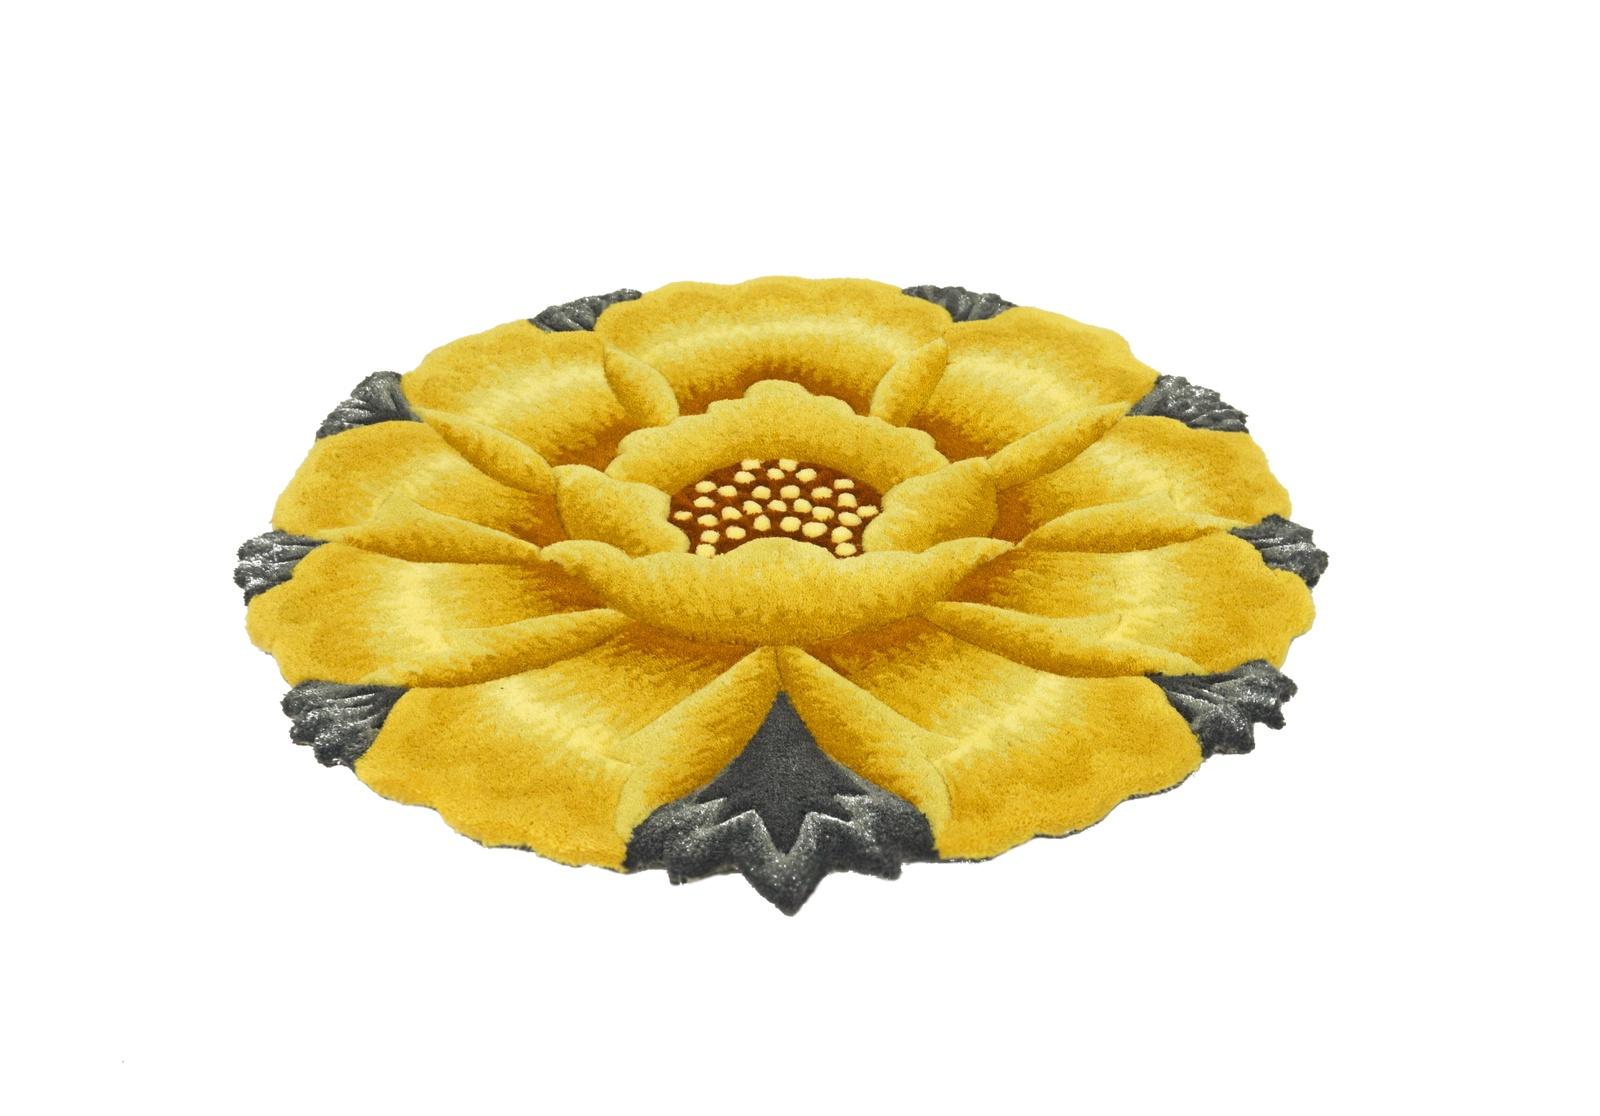 Ковер MADONNA 1,2х1,2 м /фигурный, желтый